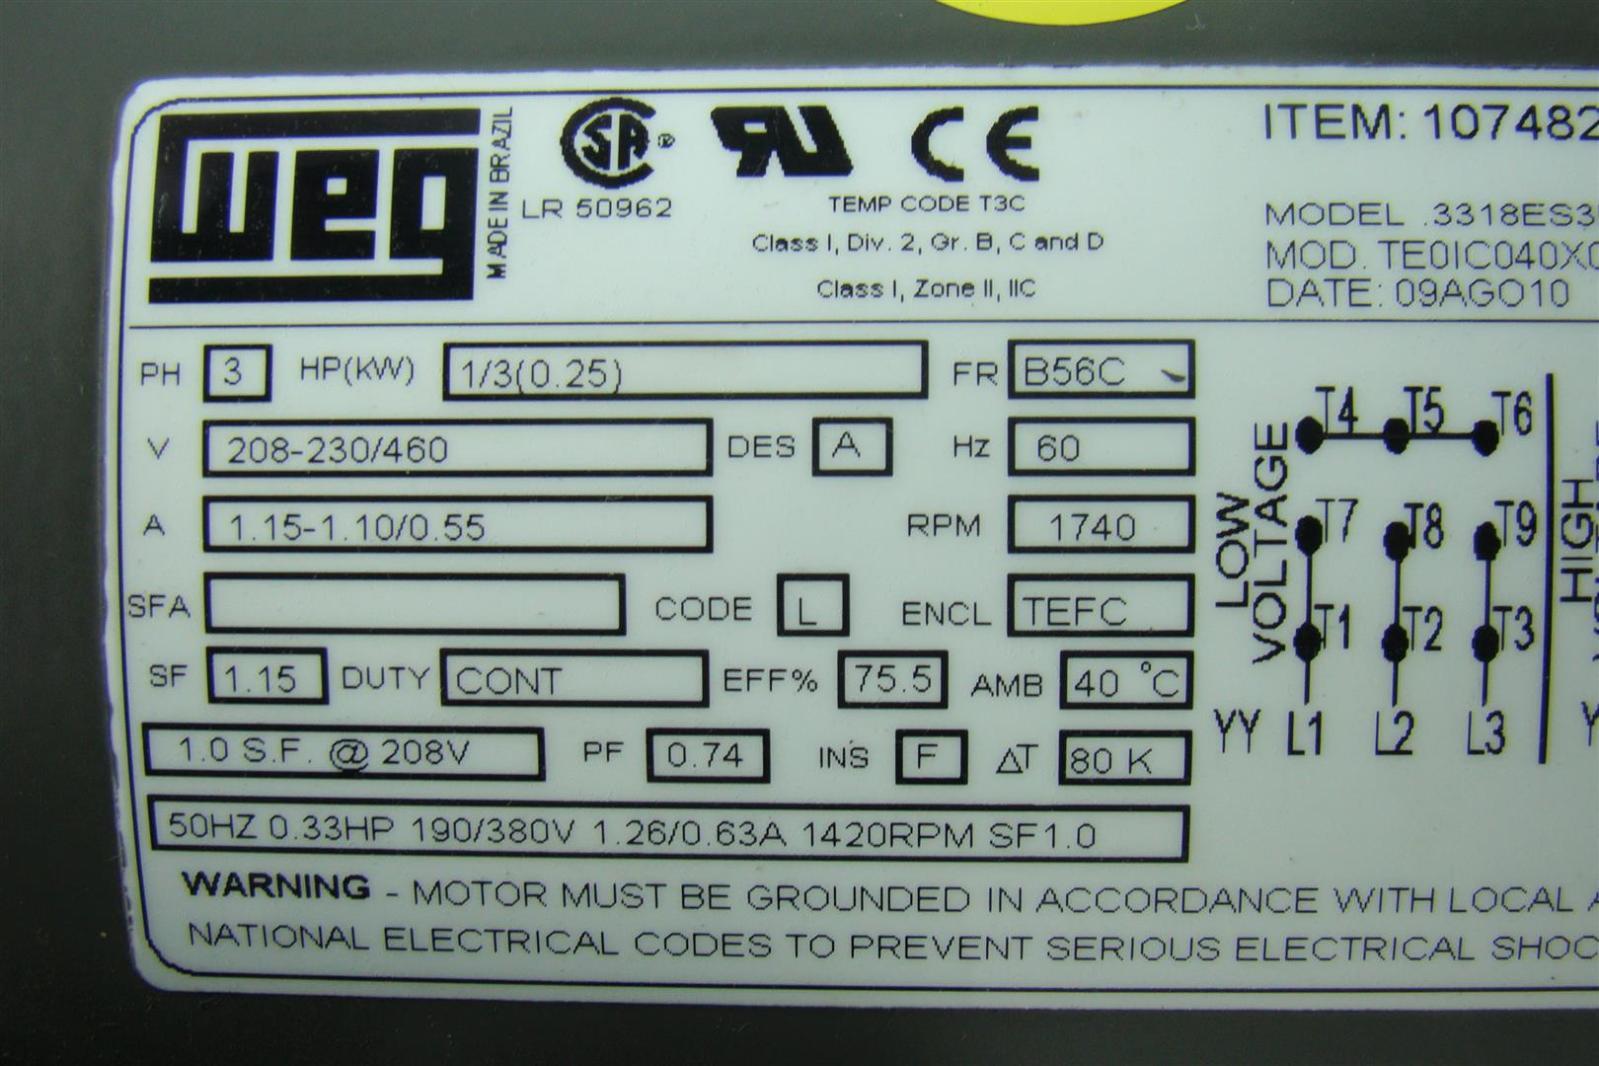 weg w22 wiring diagram caravan 13 pin class 1 div 2 motor impremedia